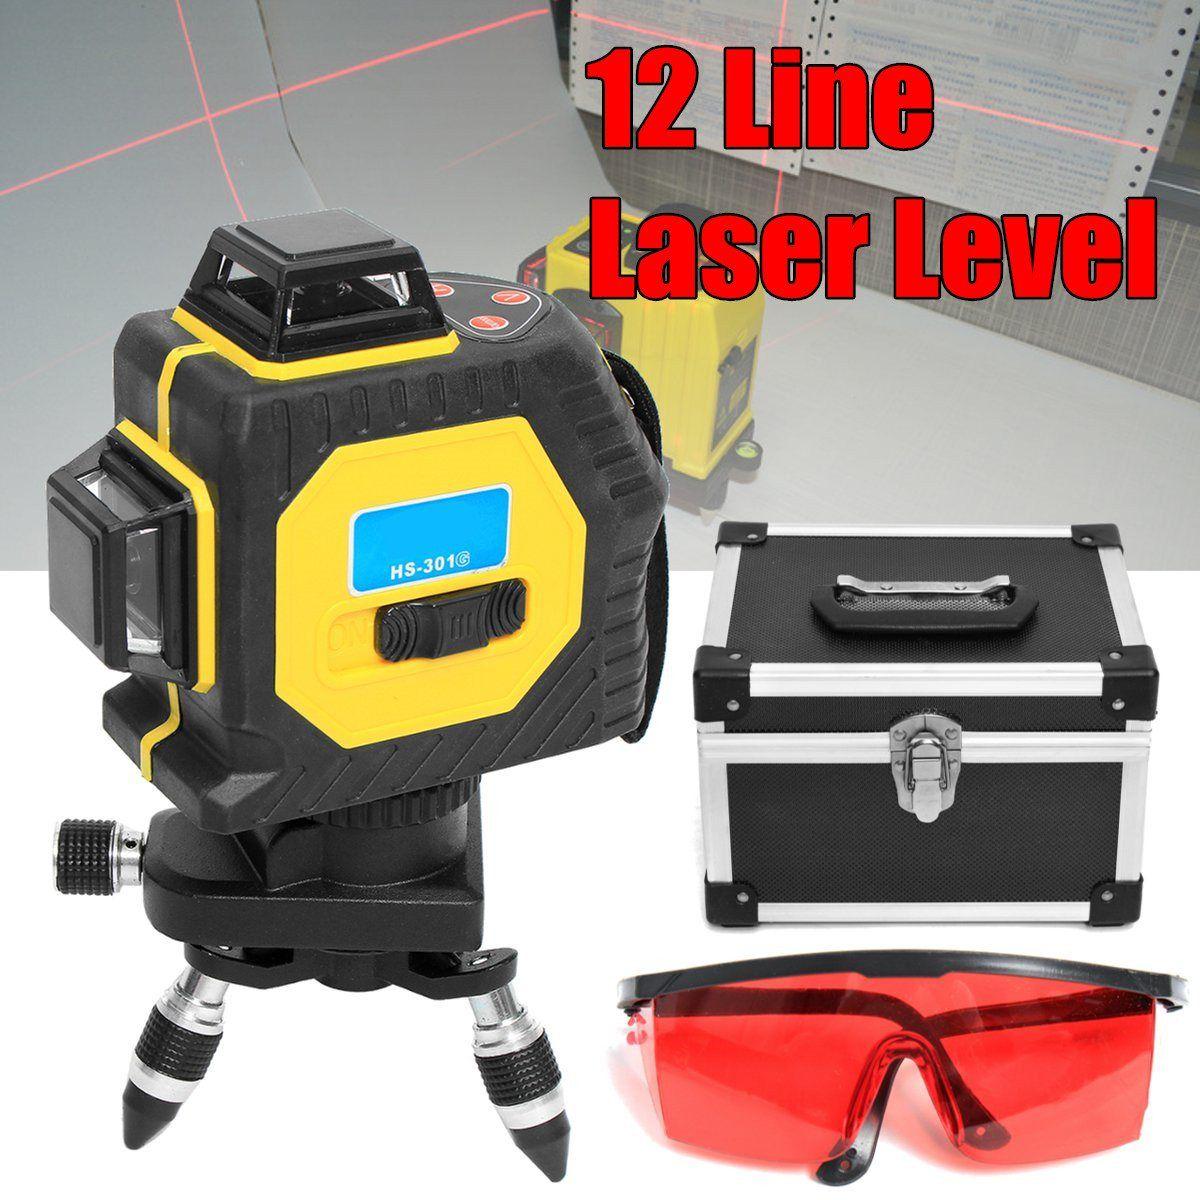 3D nivel láser 12 líneas rojas 360 grados al aire libre infrarrojo Niveles de láser instrumento de proyección autonivelante rotativo trípode kit Cruz